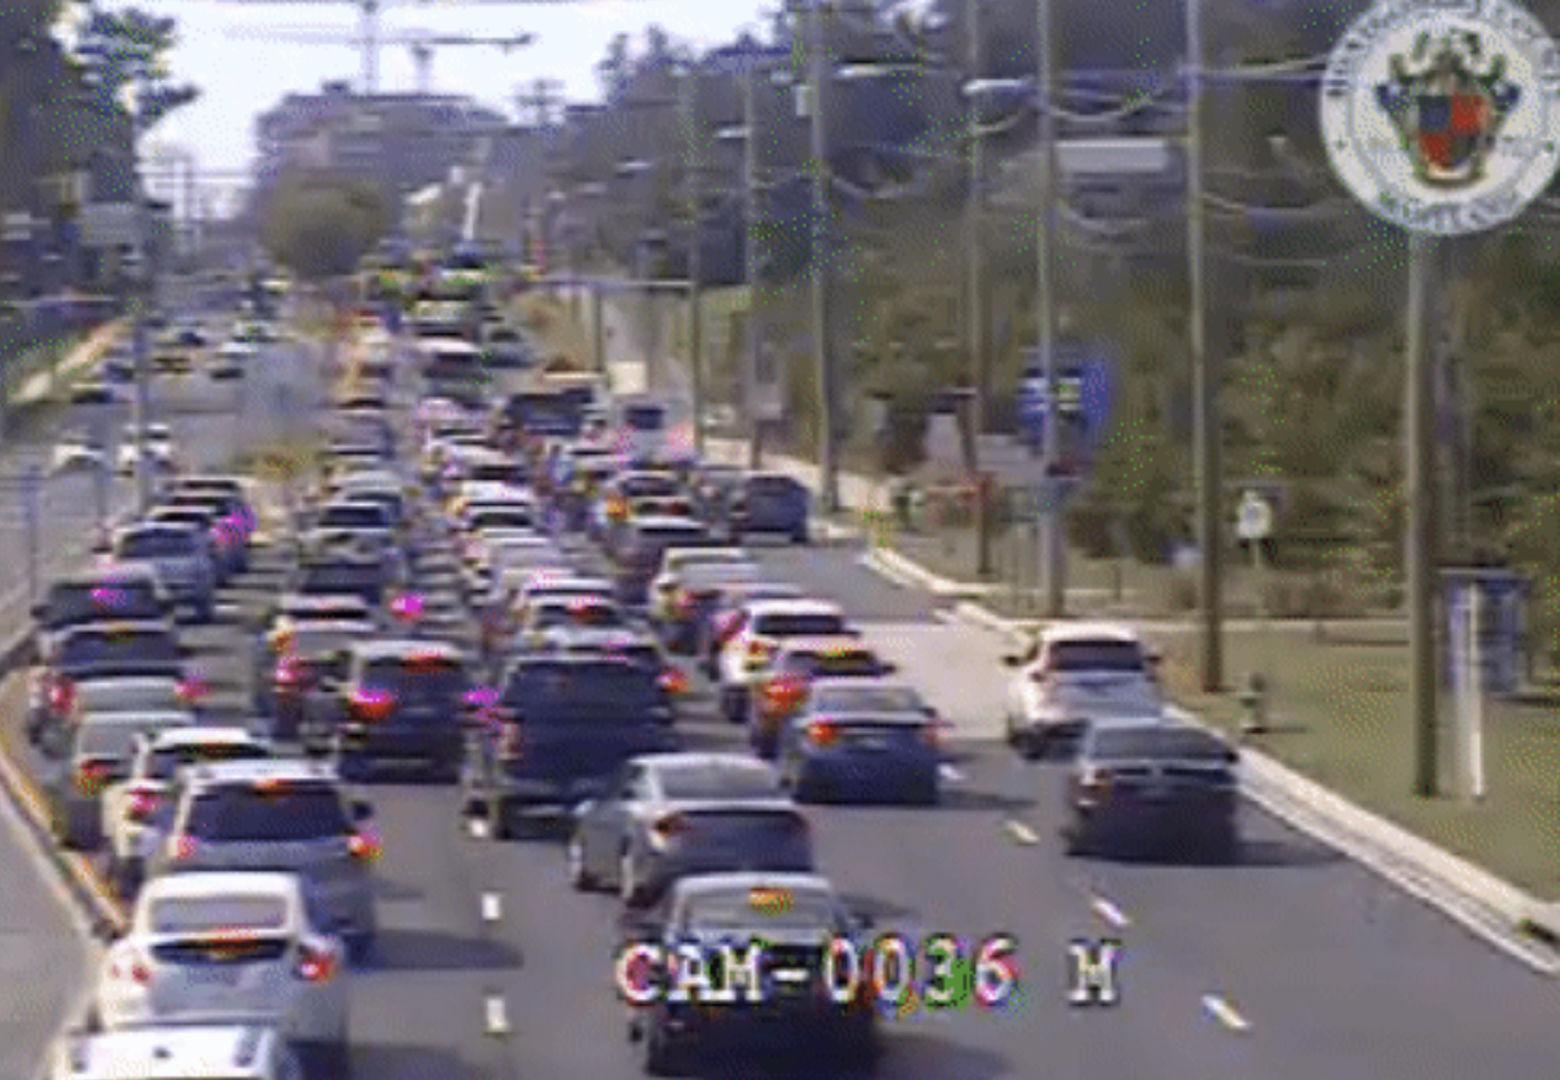 A Monday morning crash blocked lanes on Rockville Pike in north Bethesda. (Courtesy MDOT)